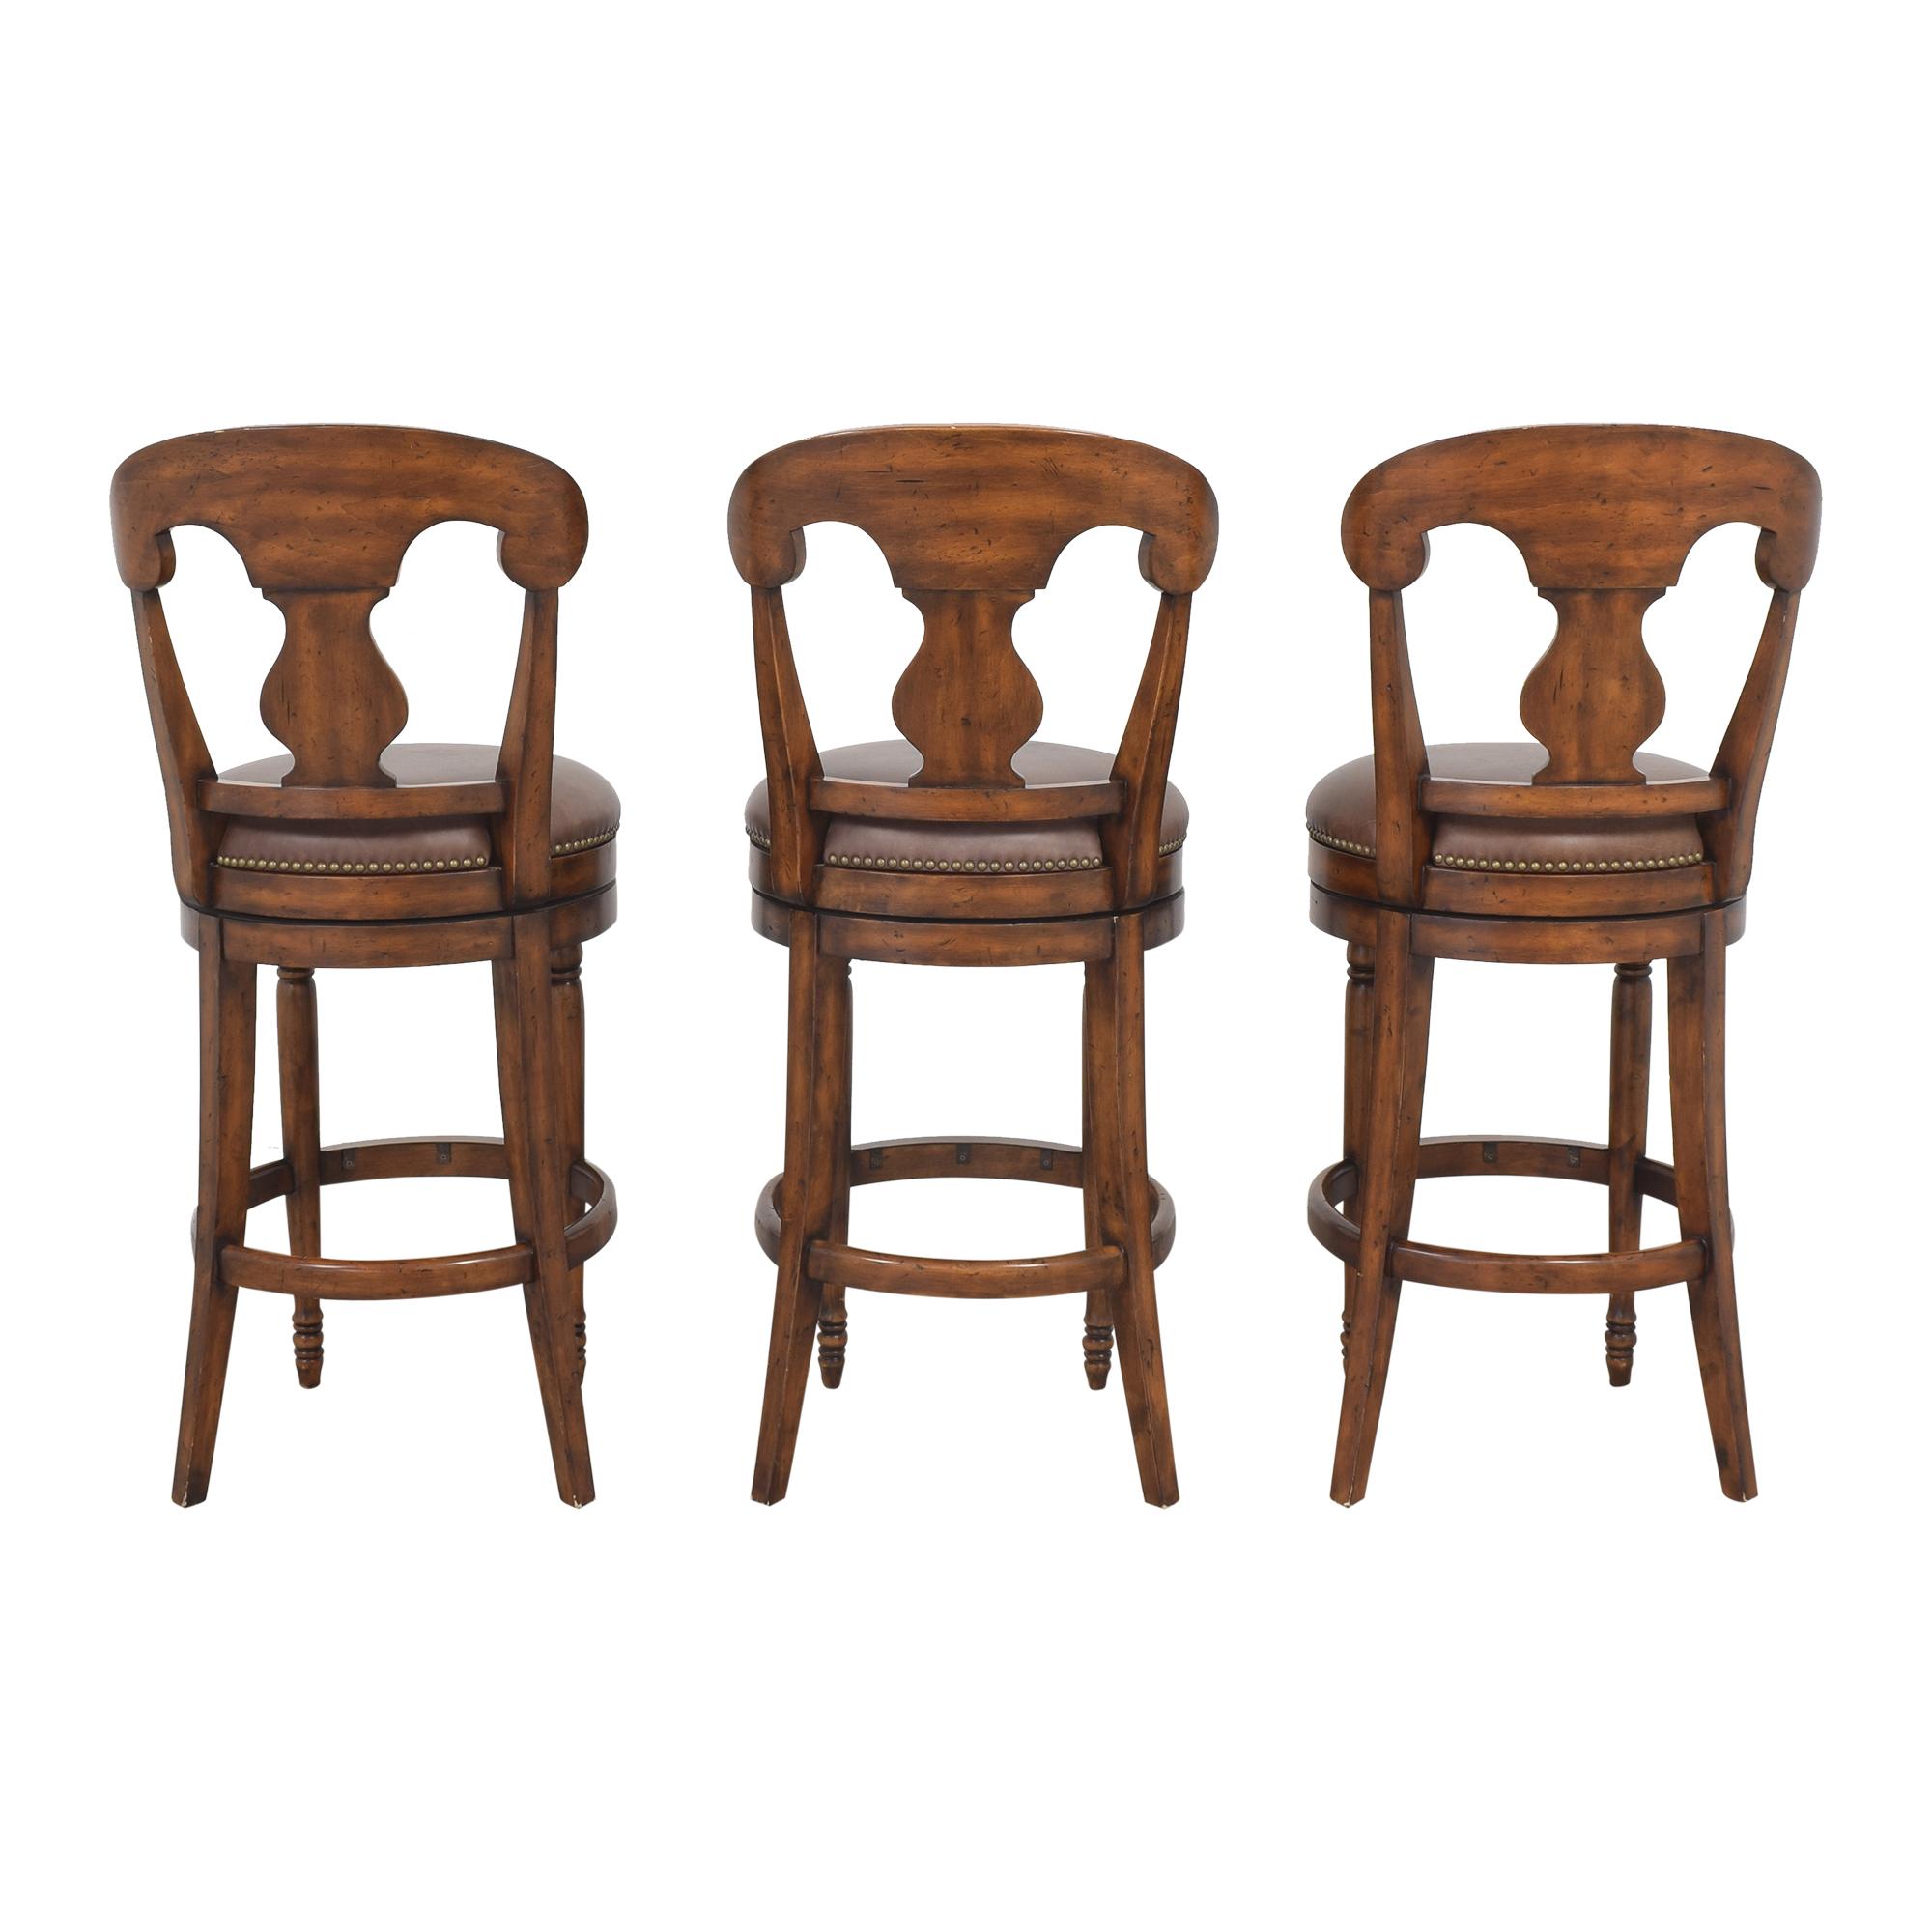 shop Artistica Westchester Swivel Bar Stools Artistica Chairs